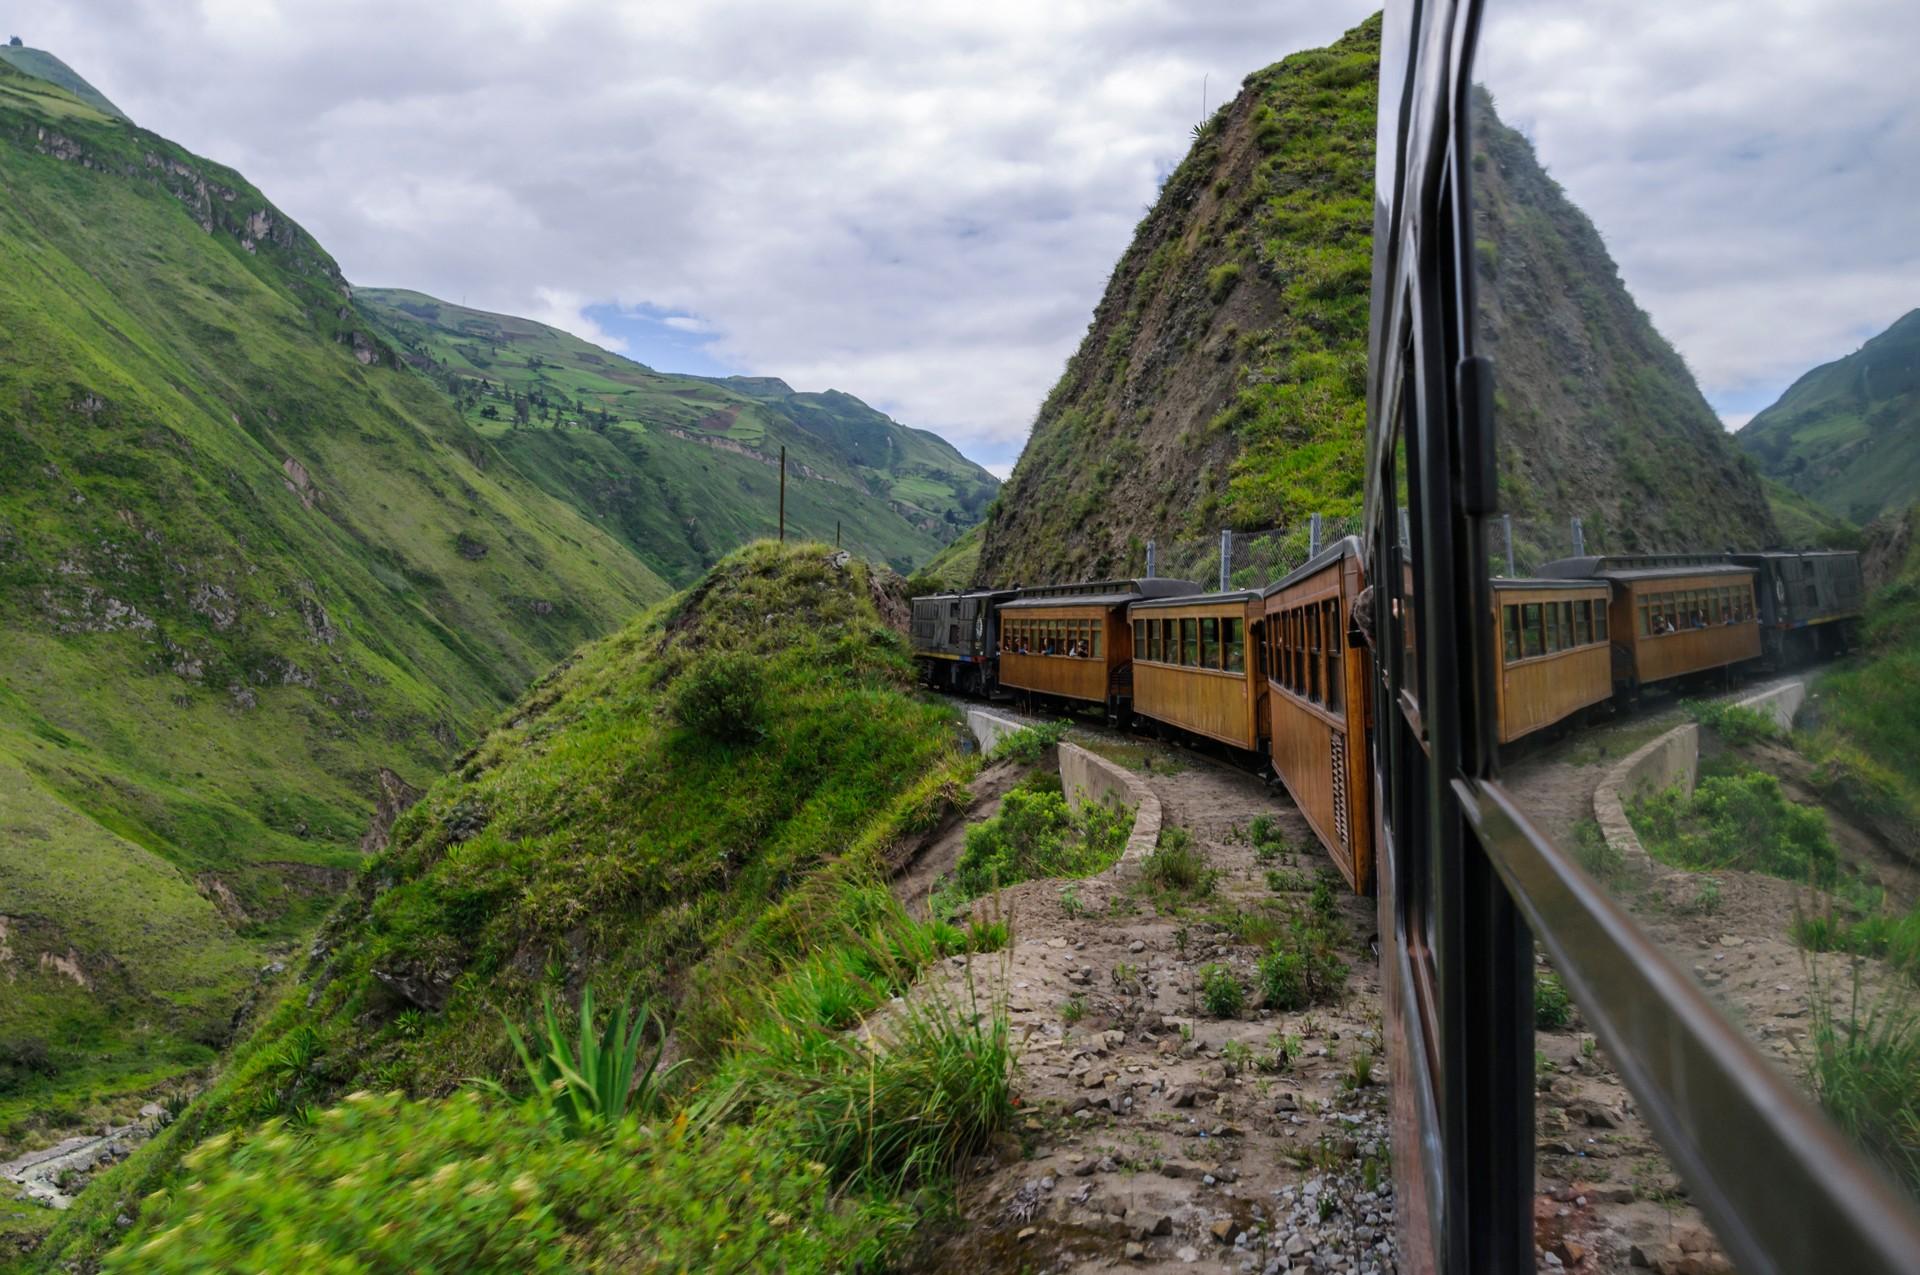 Top 10 scenic journeys: Devils Nose, Ecuador